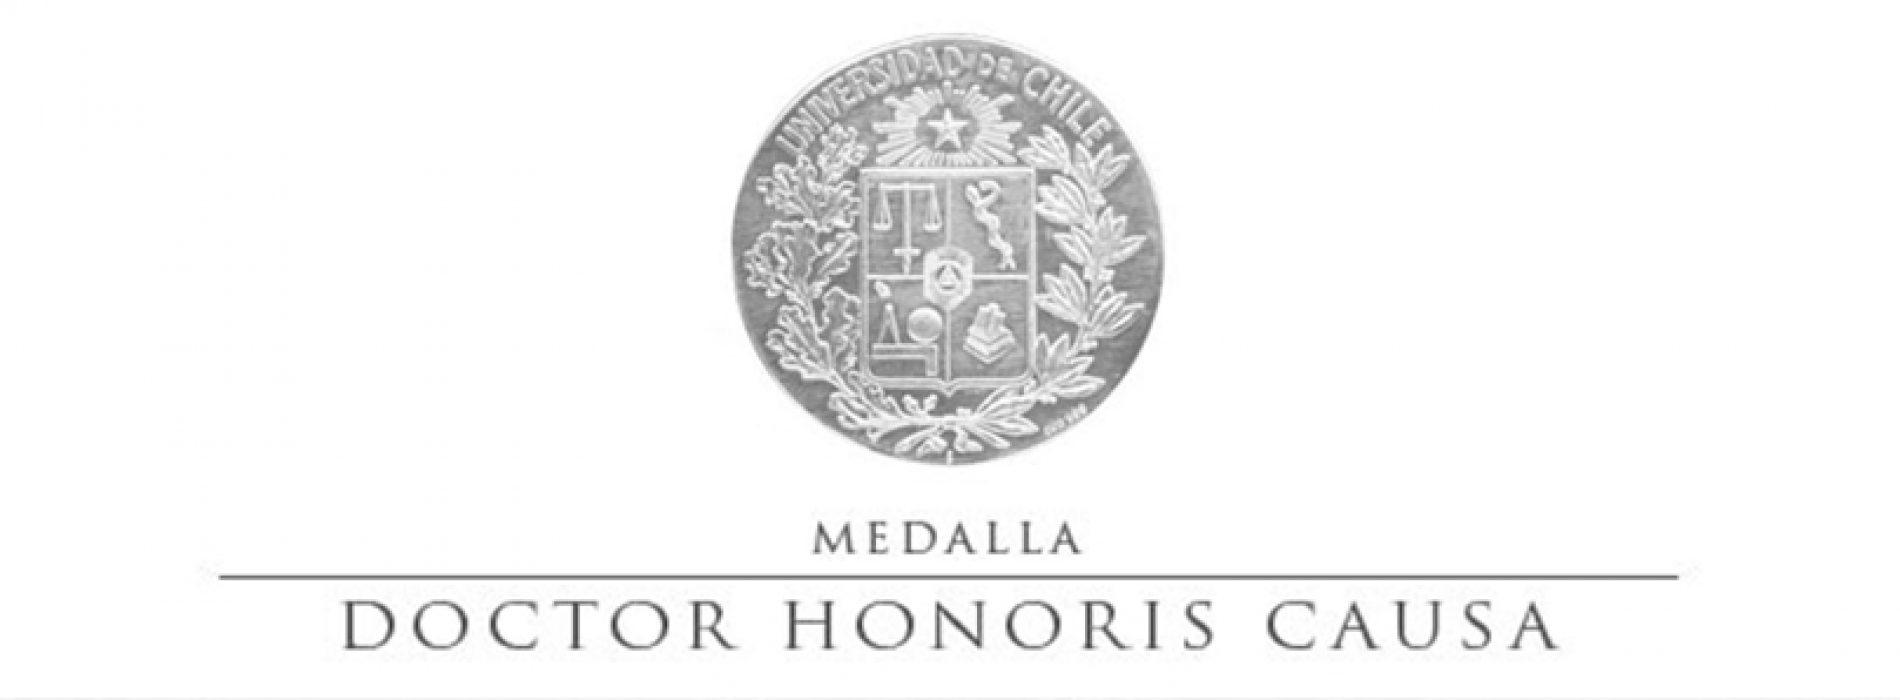 Honorary invitation to Mr. Serge Haroche